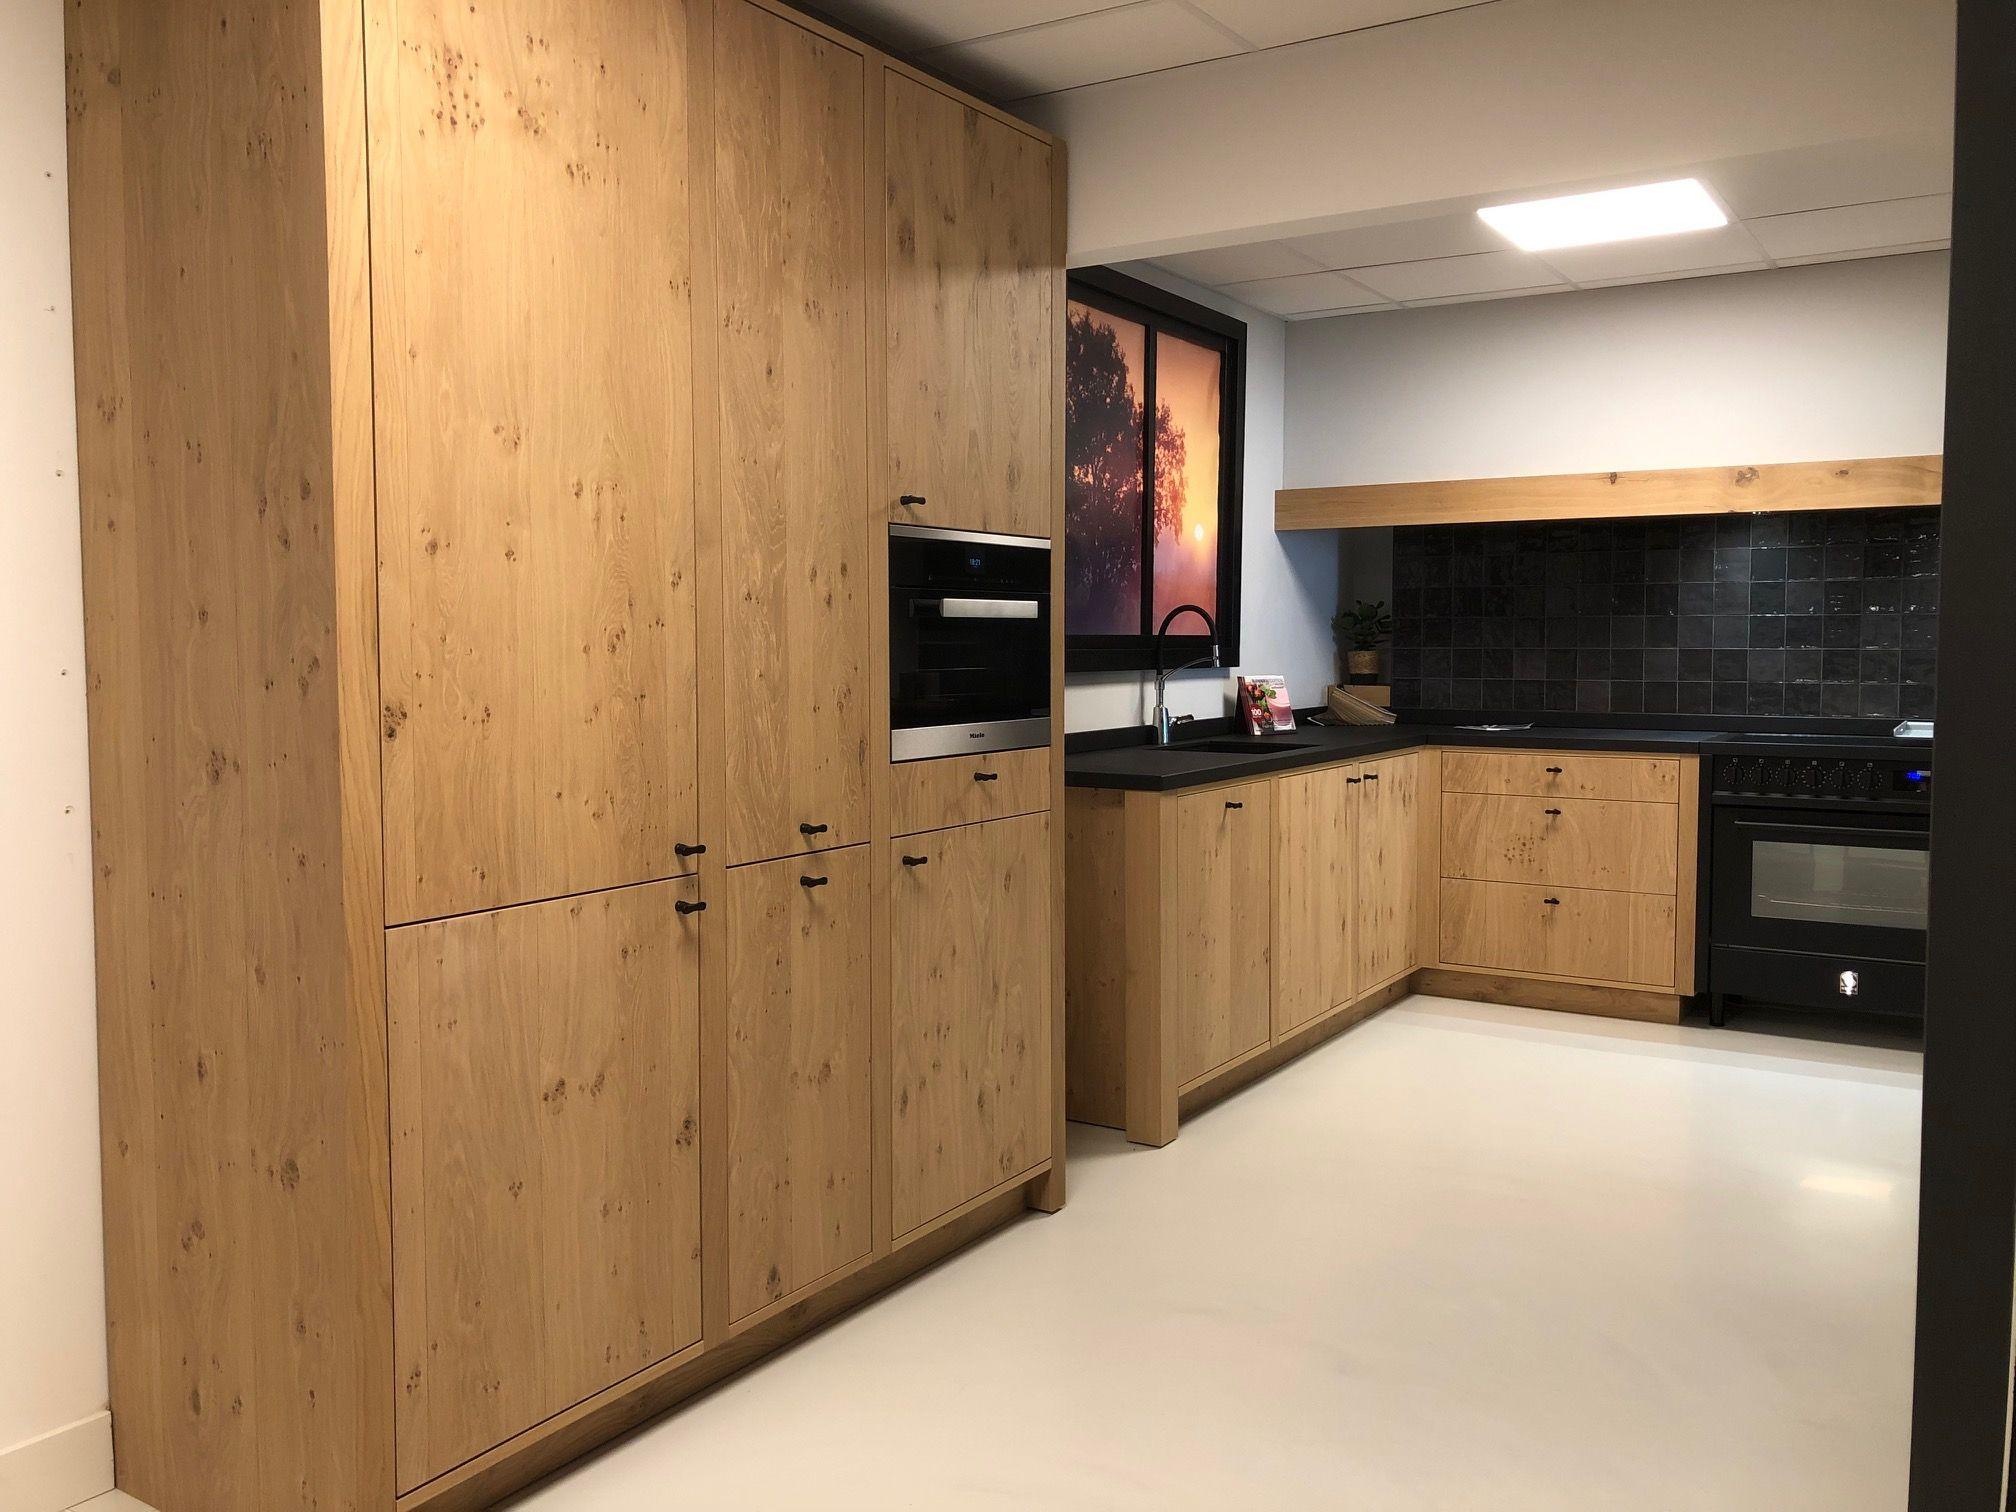 Handgemaakte keuken met Miele apparatuur